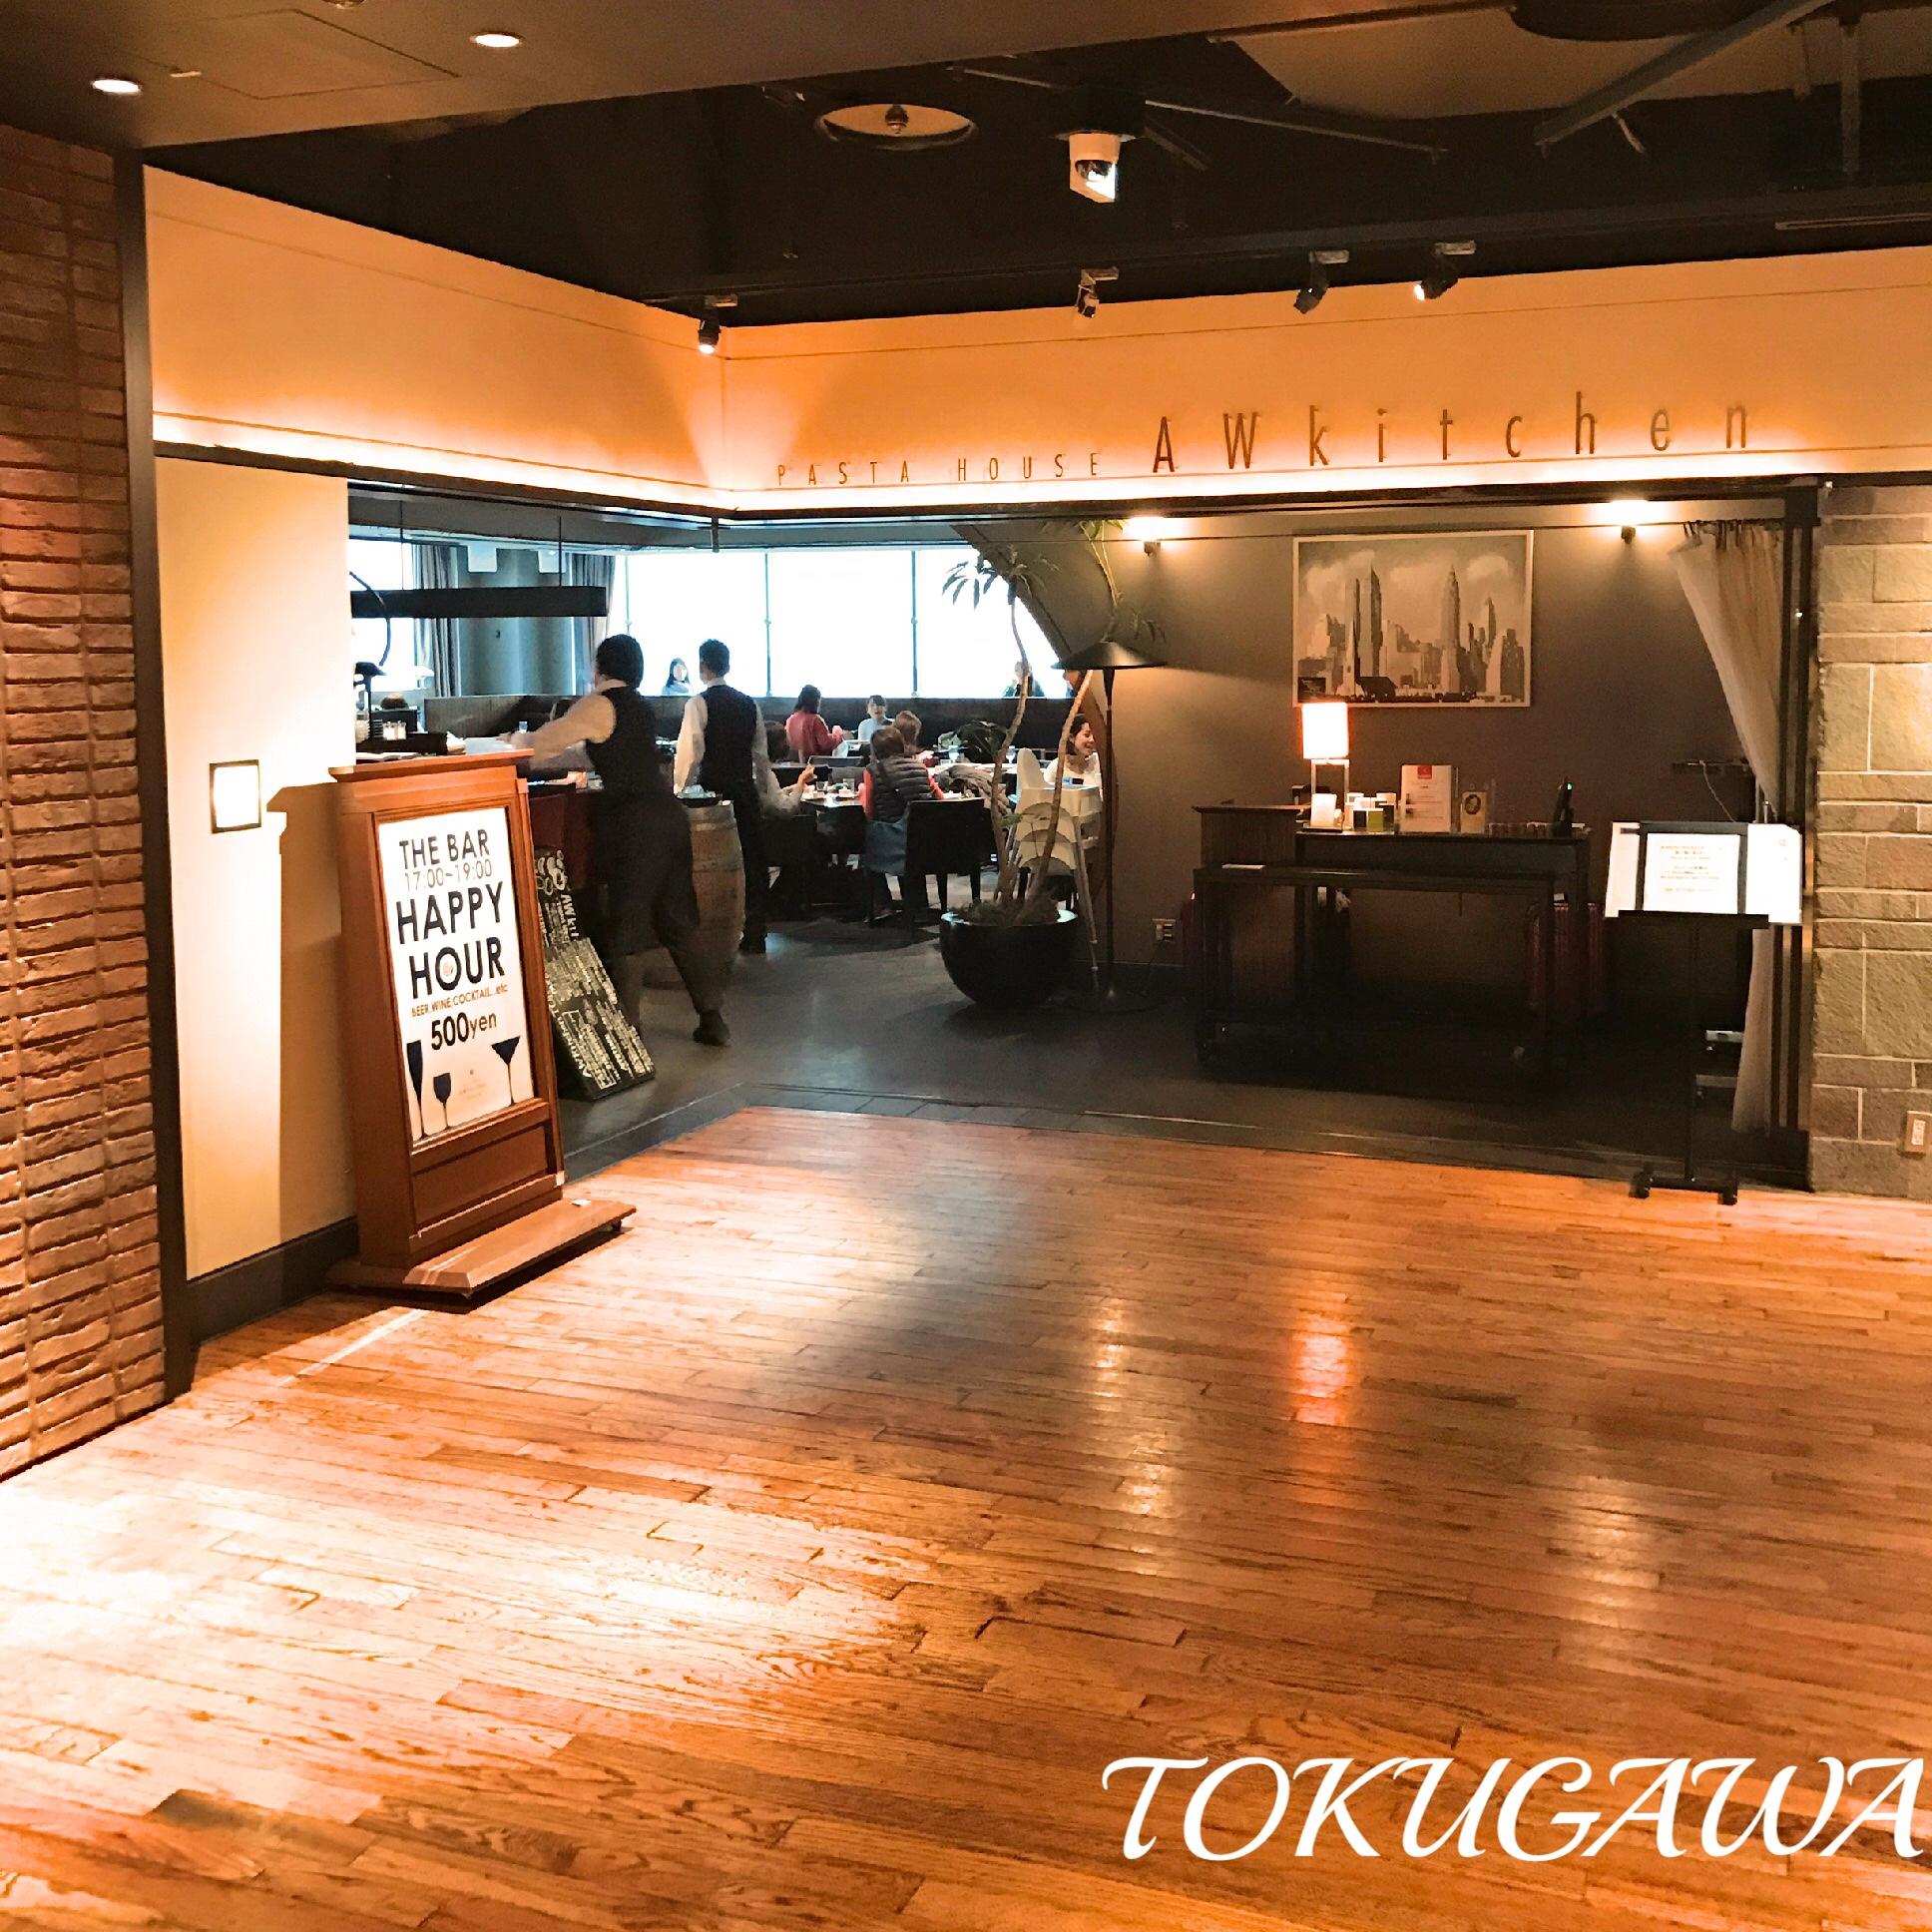 AWkitchen TOKYO 新丸ビル店 ランチビュッフェで満足の90分! ぶらり ...